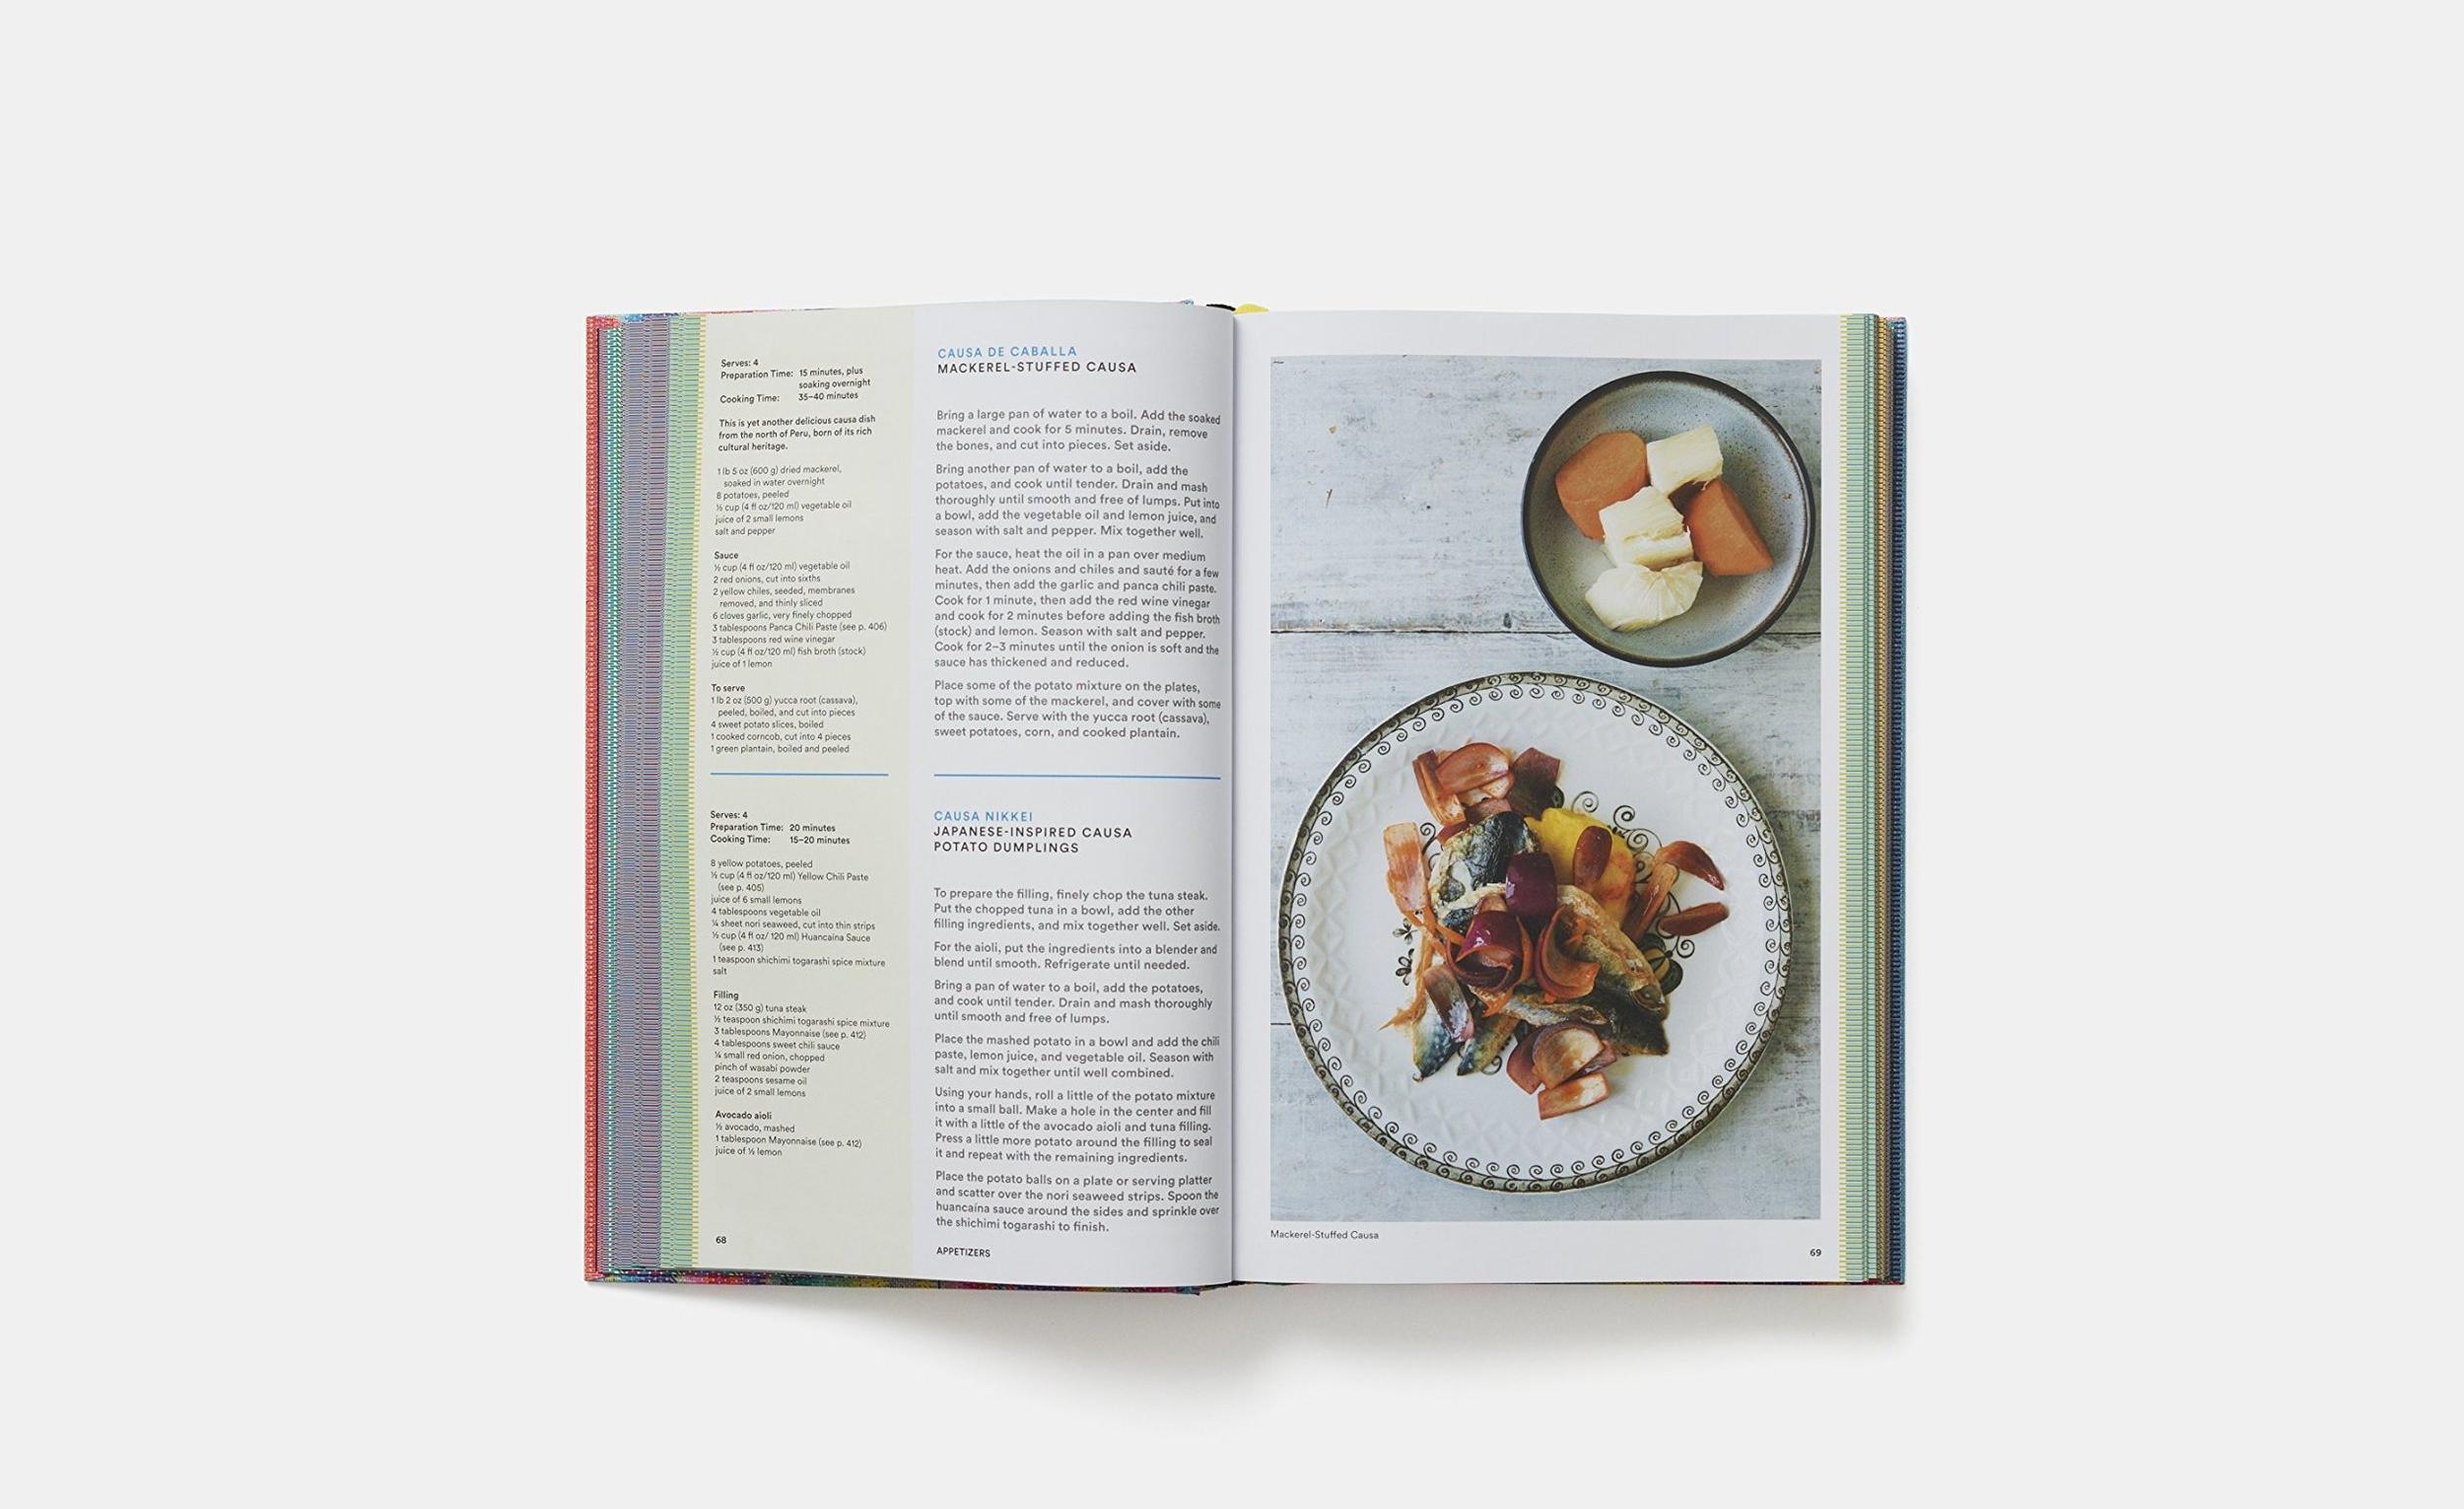 LB - Image - Book - Peru Phaidon cookbook1.jpg